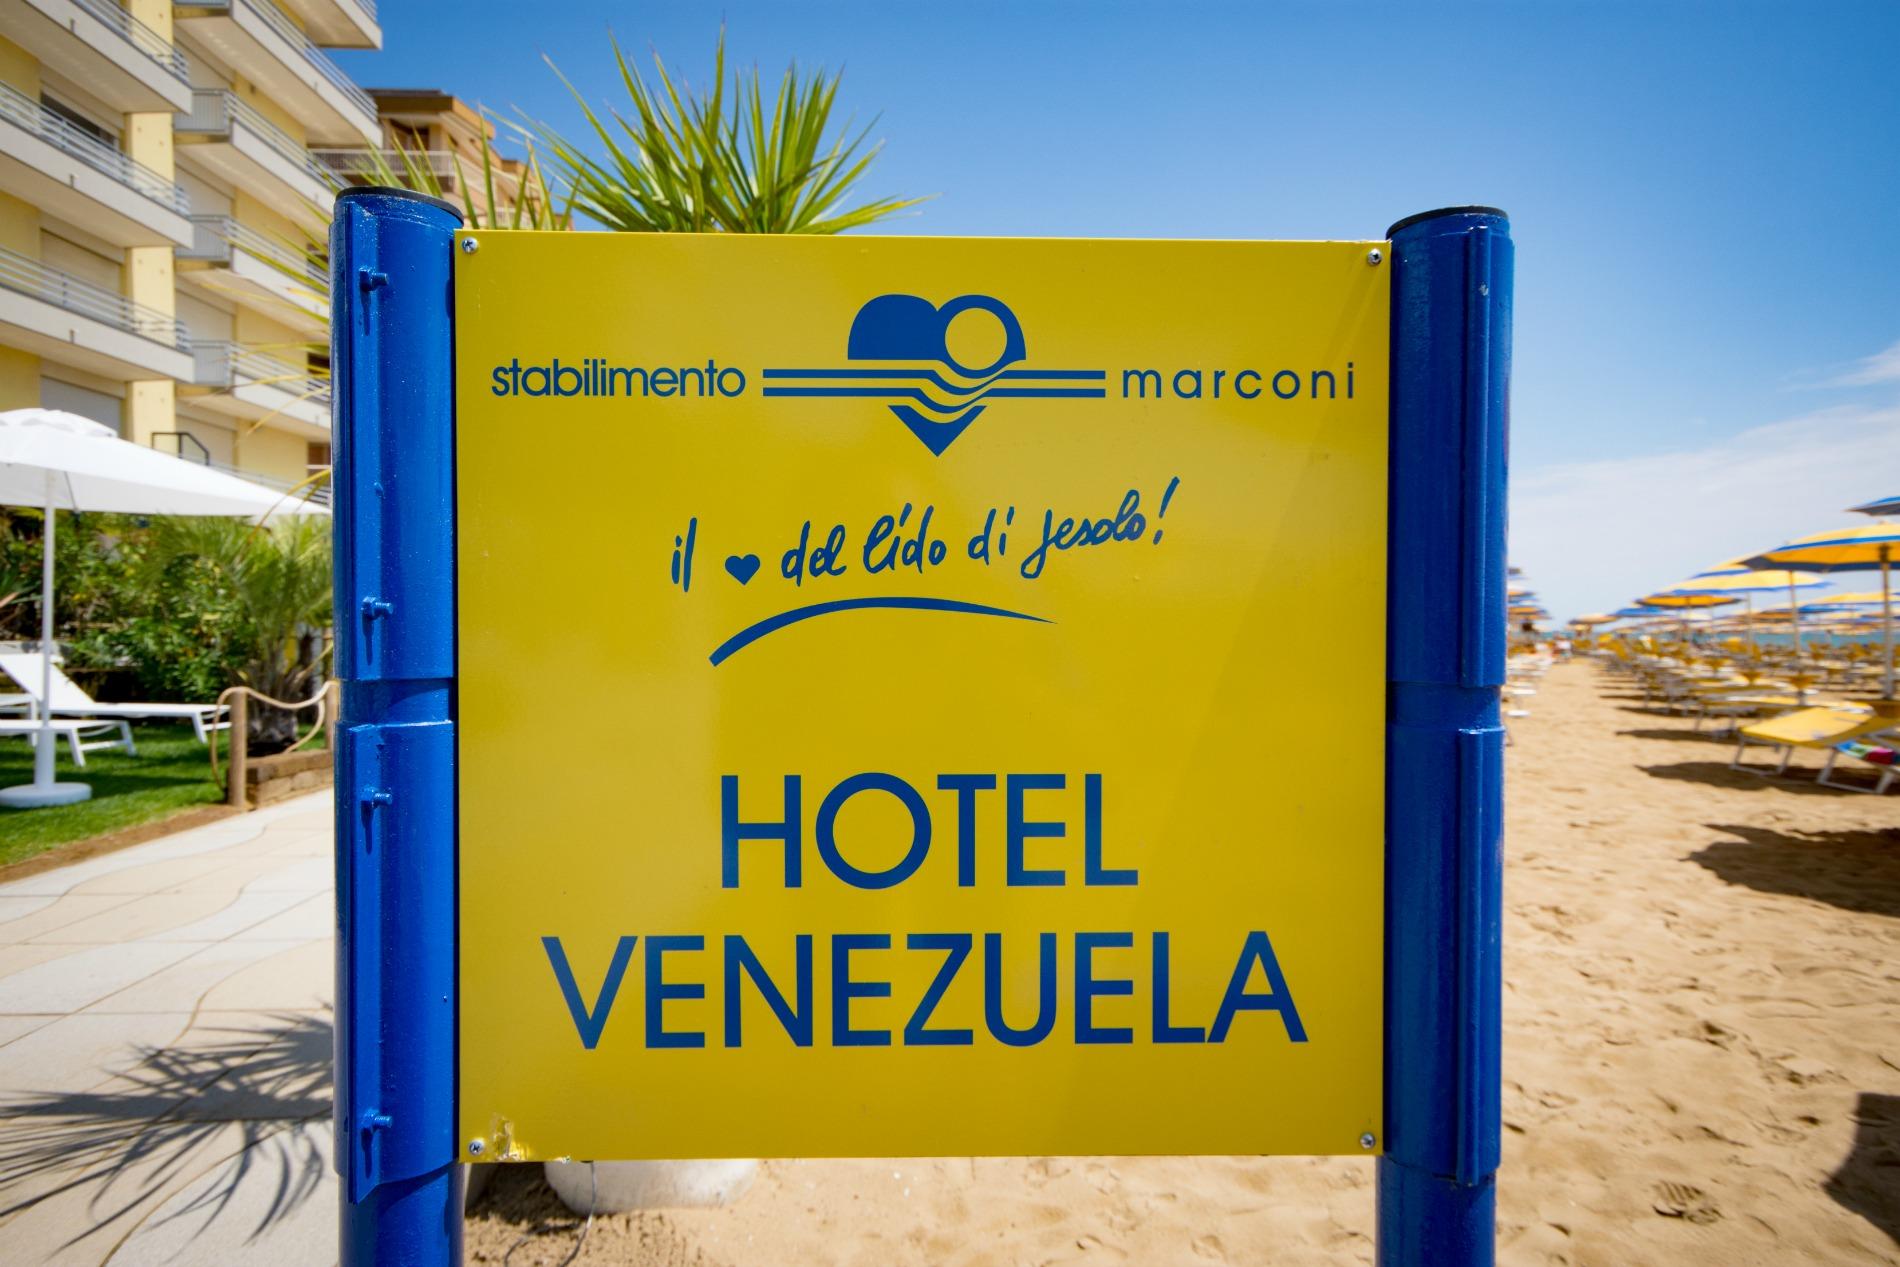 http://www.hotelvenezuela.it/wp-content/uploads/2016/02/spiaggia.jpeg